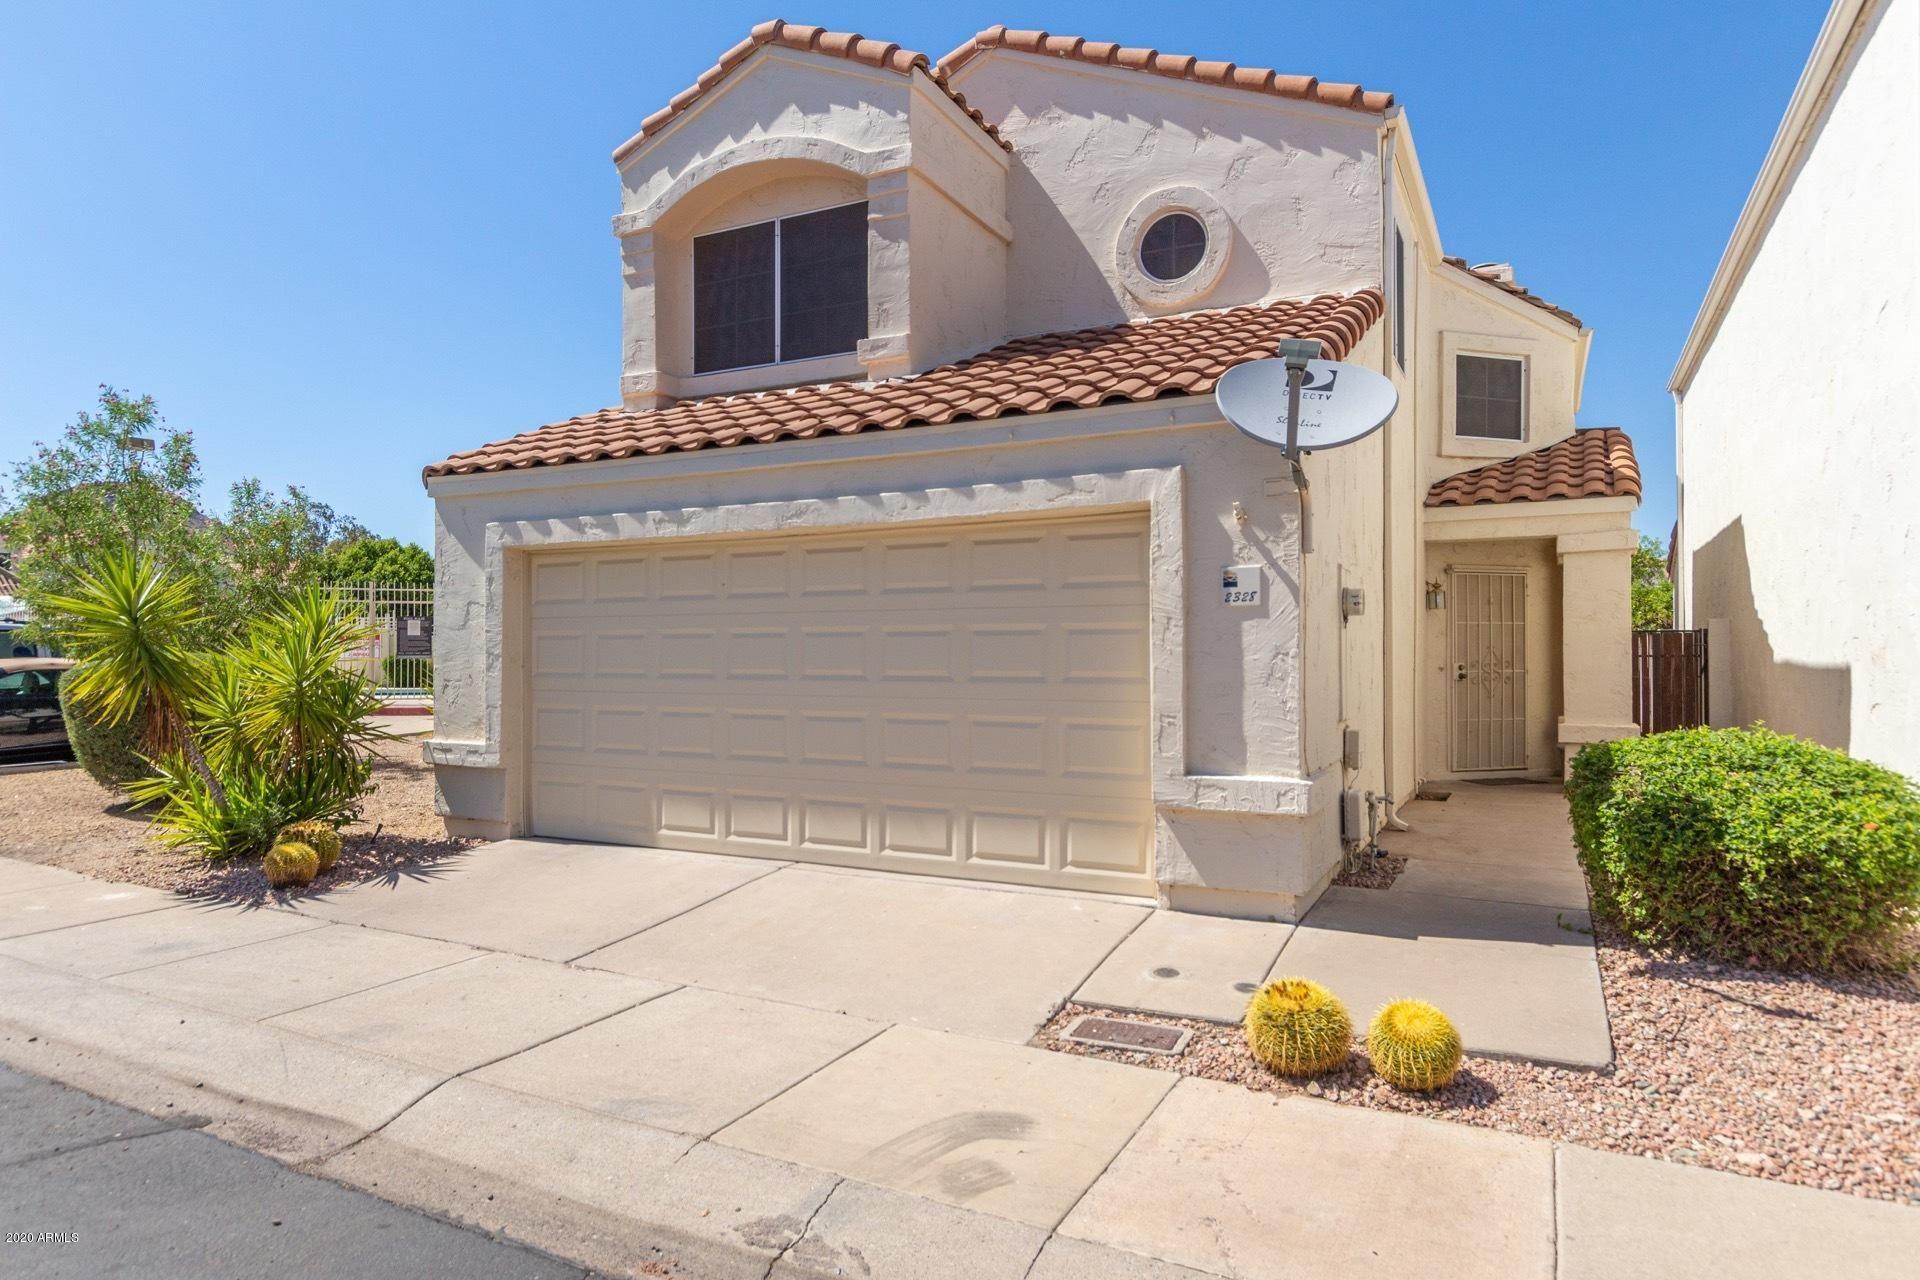 2328 E GELDING Drive, Phoenix, AZ 85022 - #: 6084803